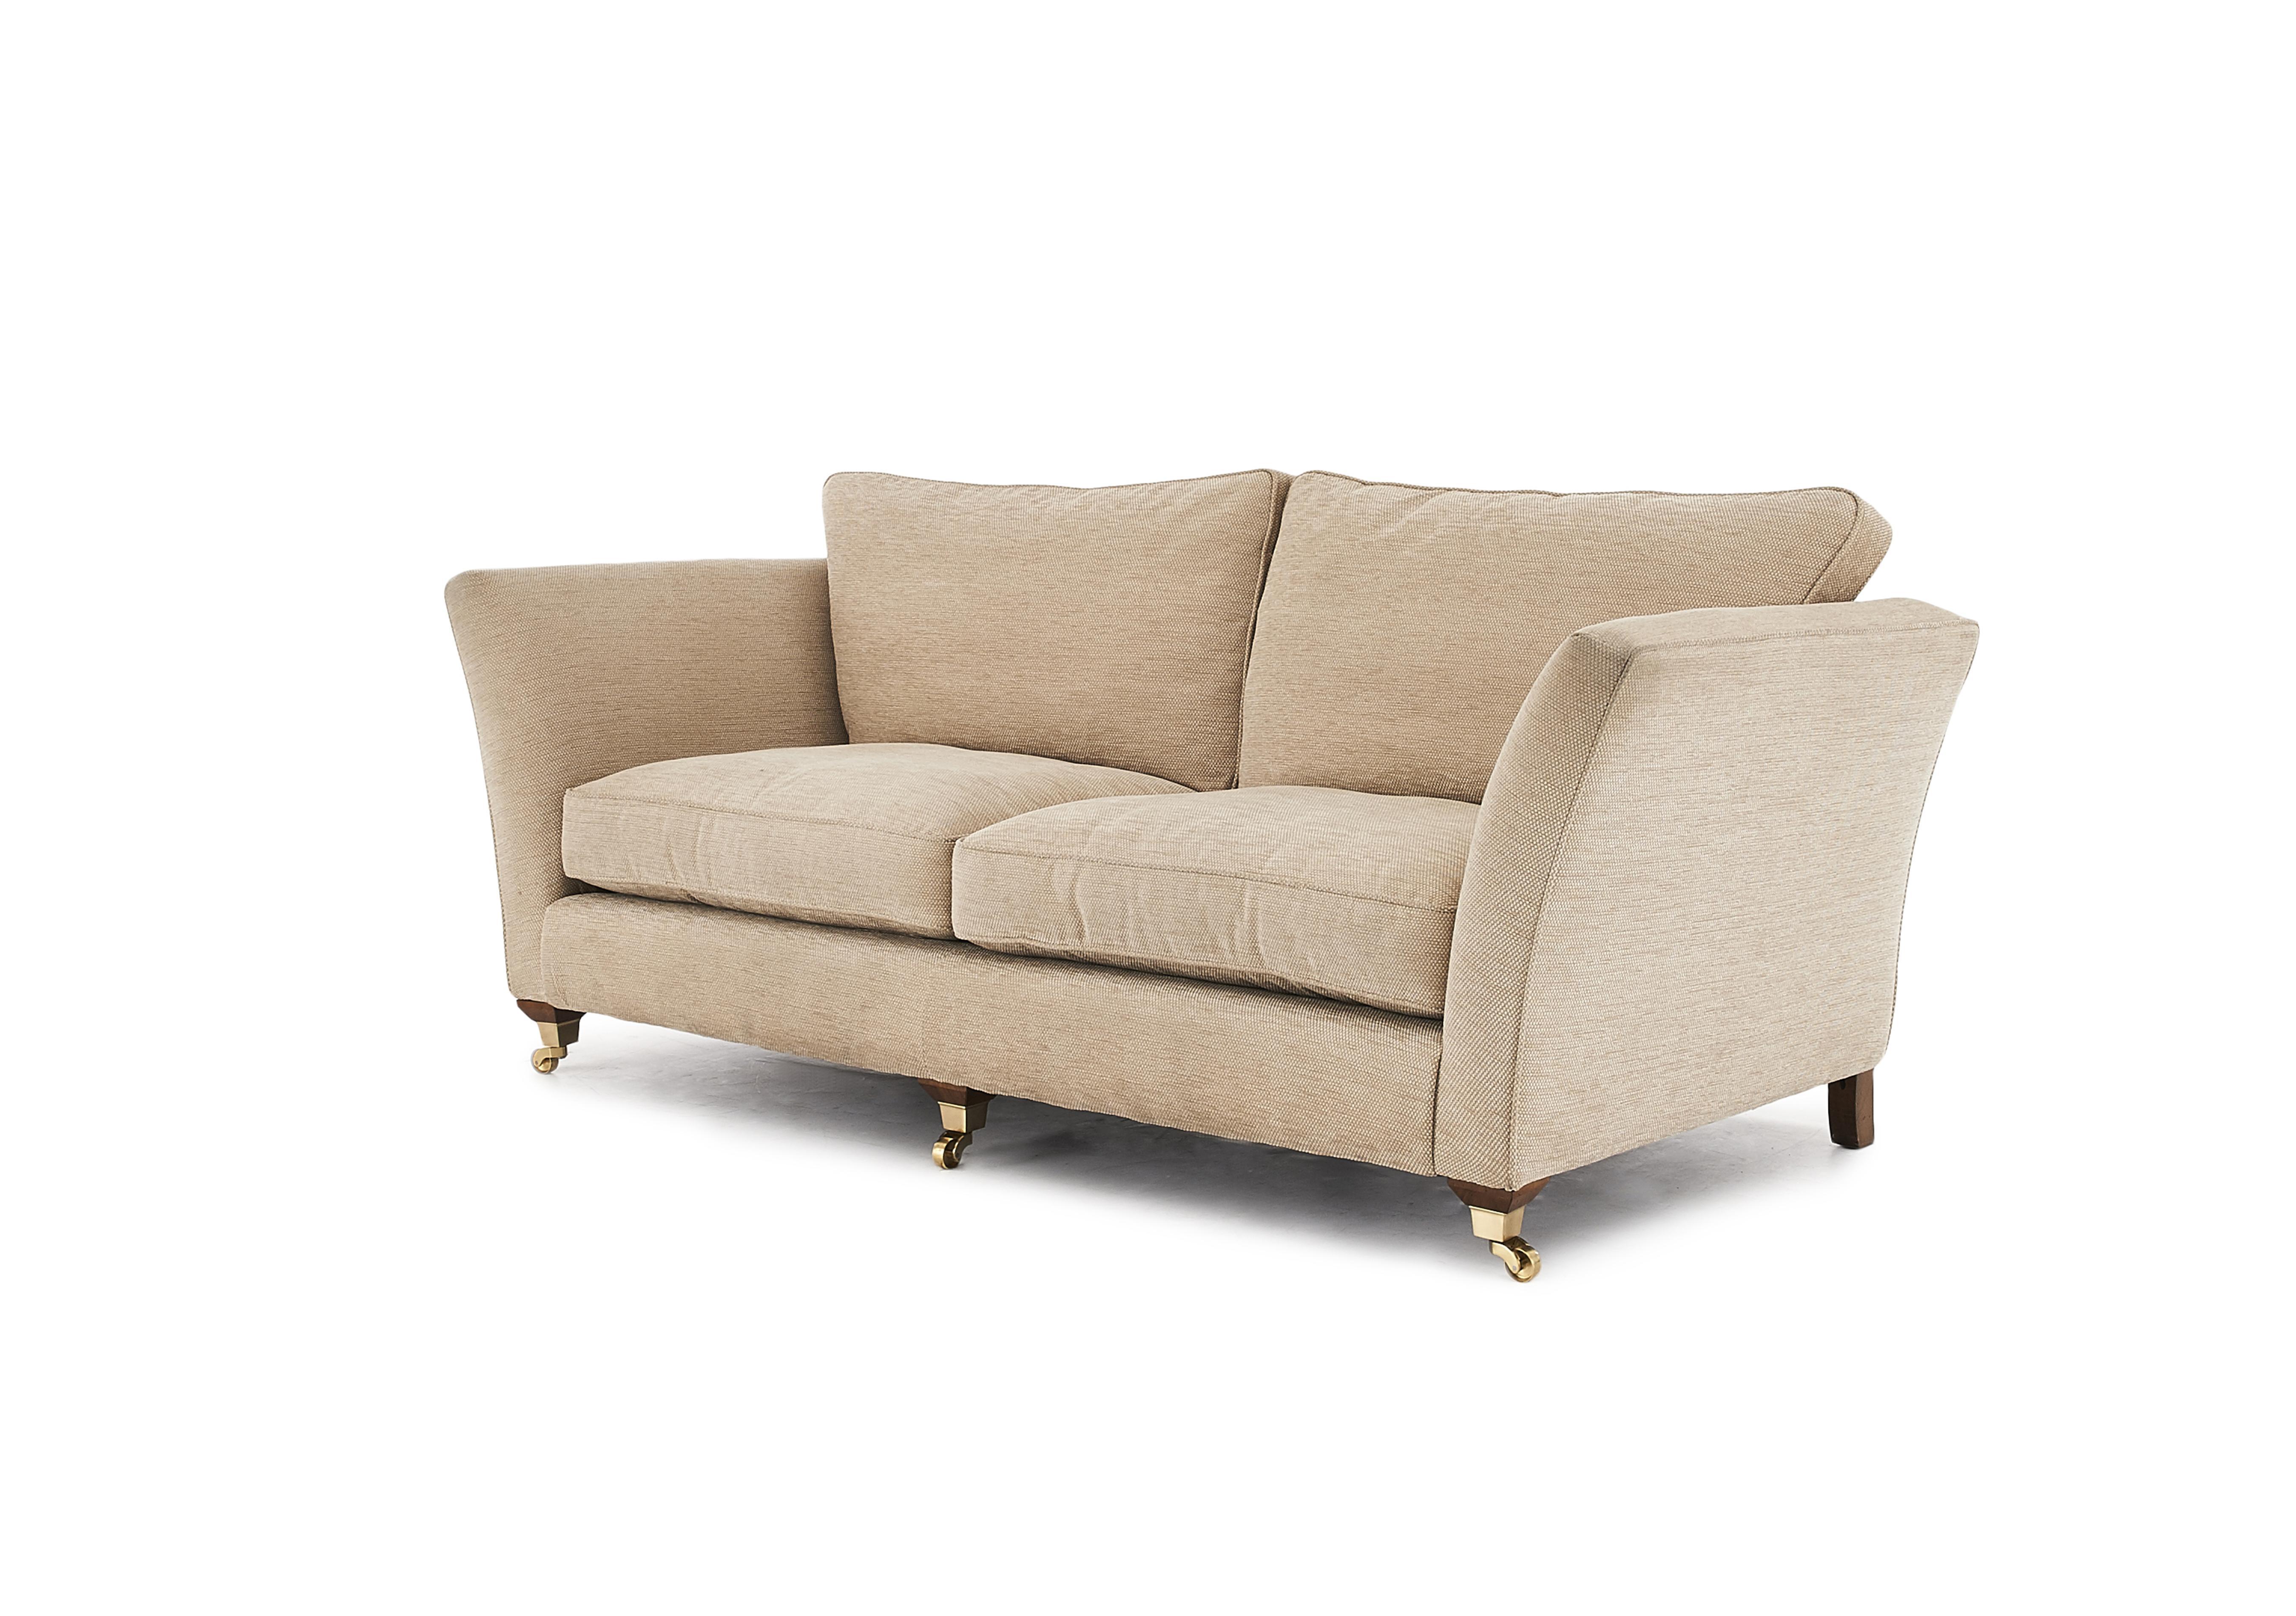 Vantage 3 Seater Fabric SofaFurniture Village